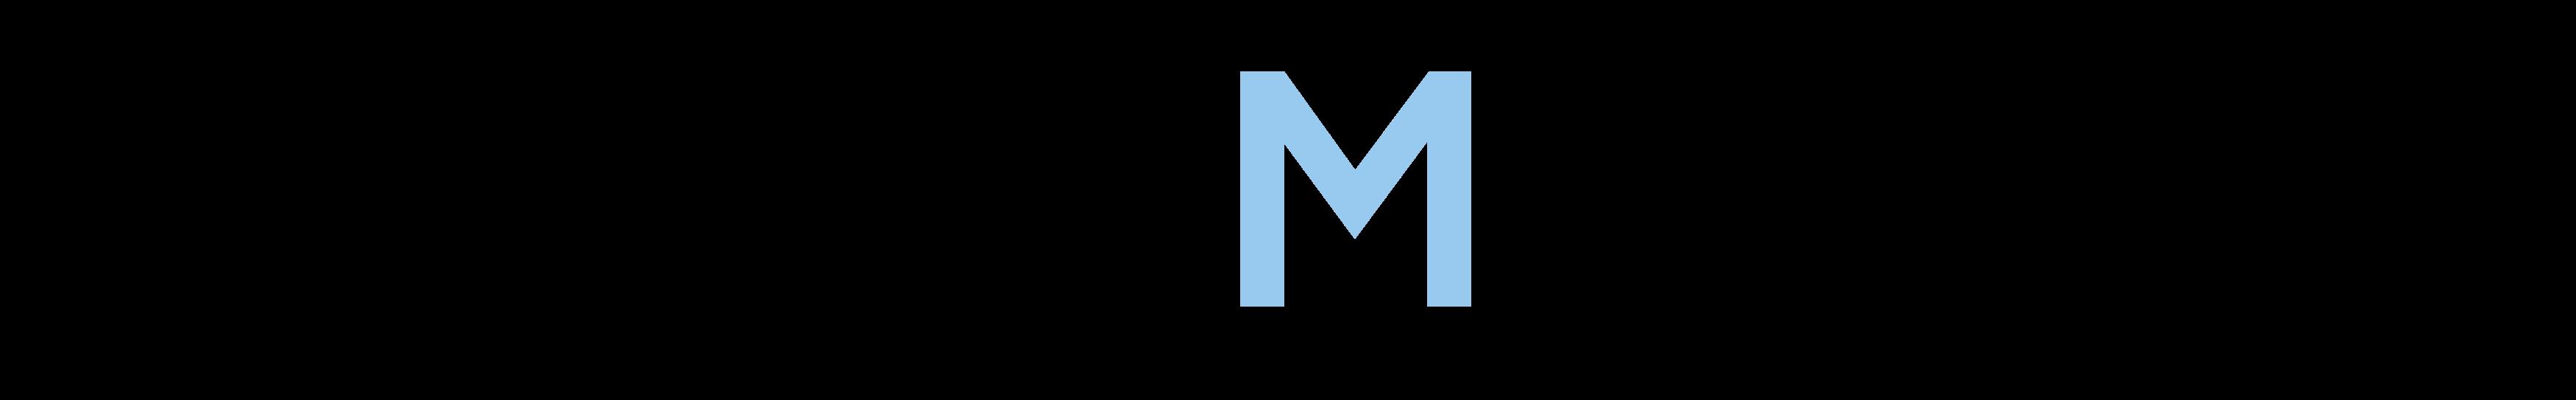 File:Samsung Galaxy M Series logo.png - Wikimedia Commons